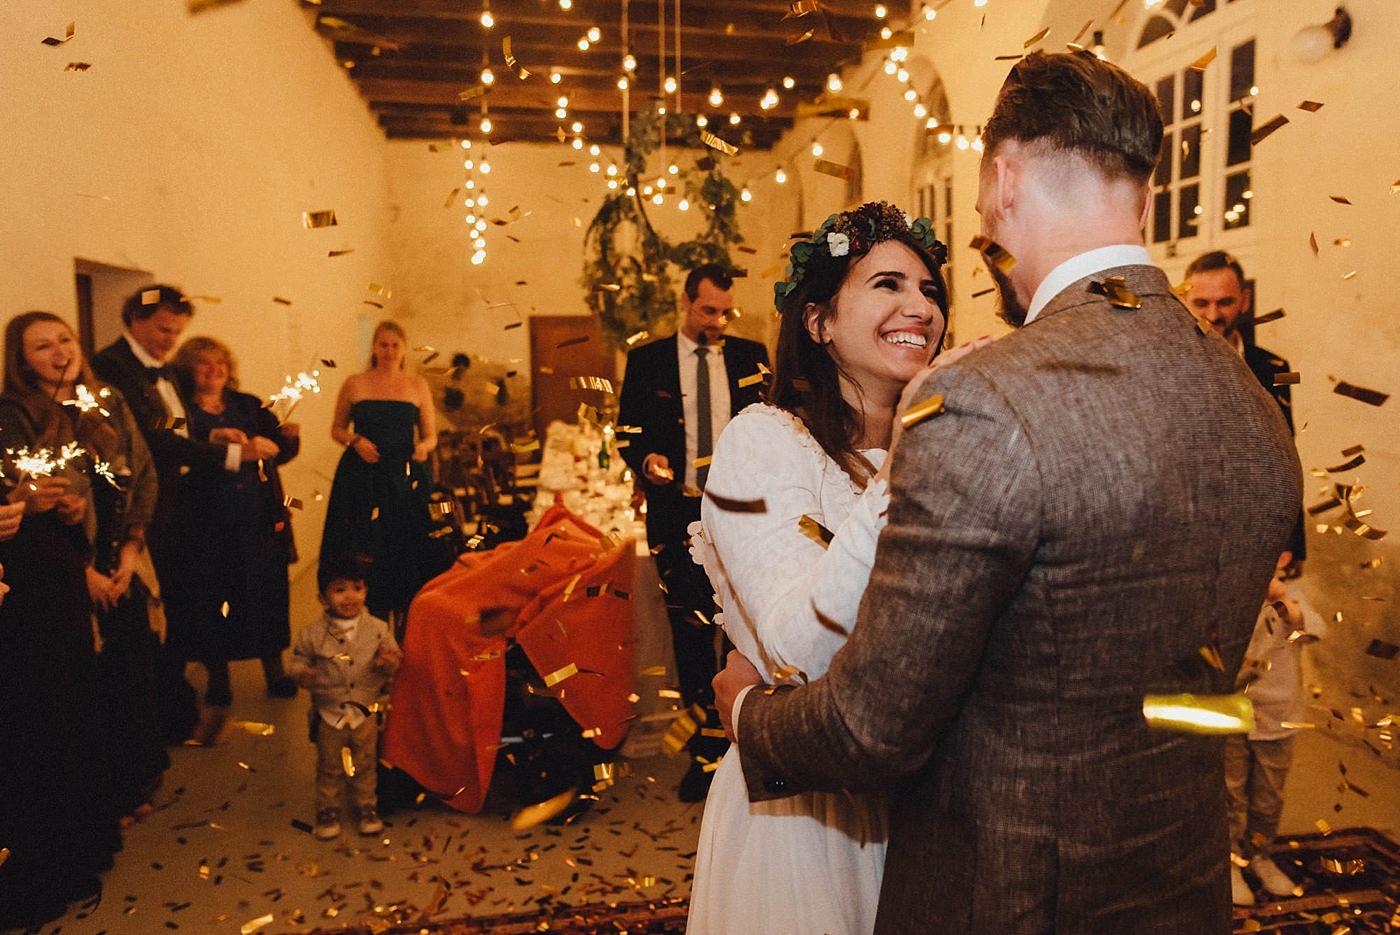 urban-elopement-wedding-271